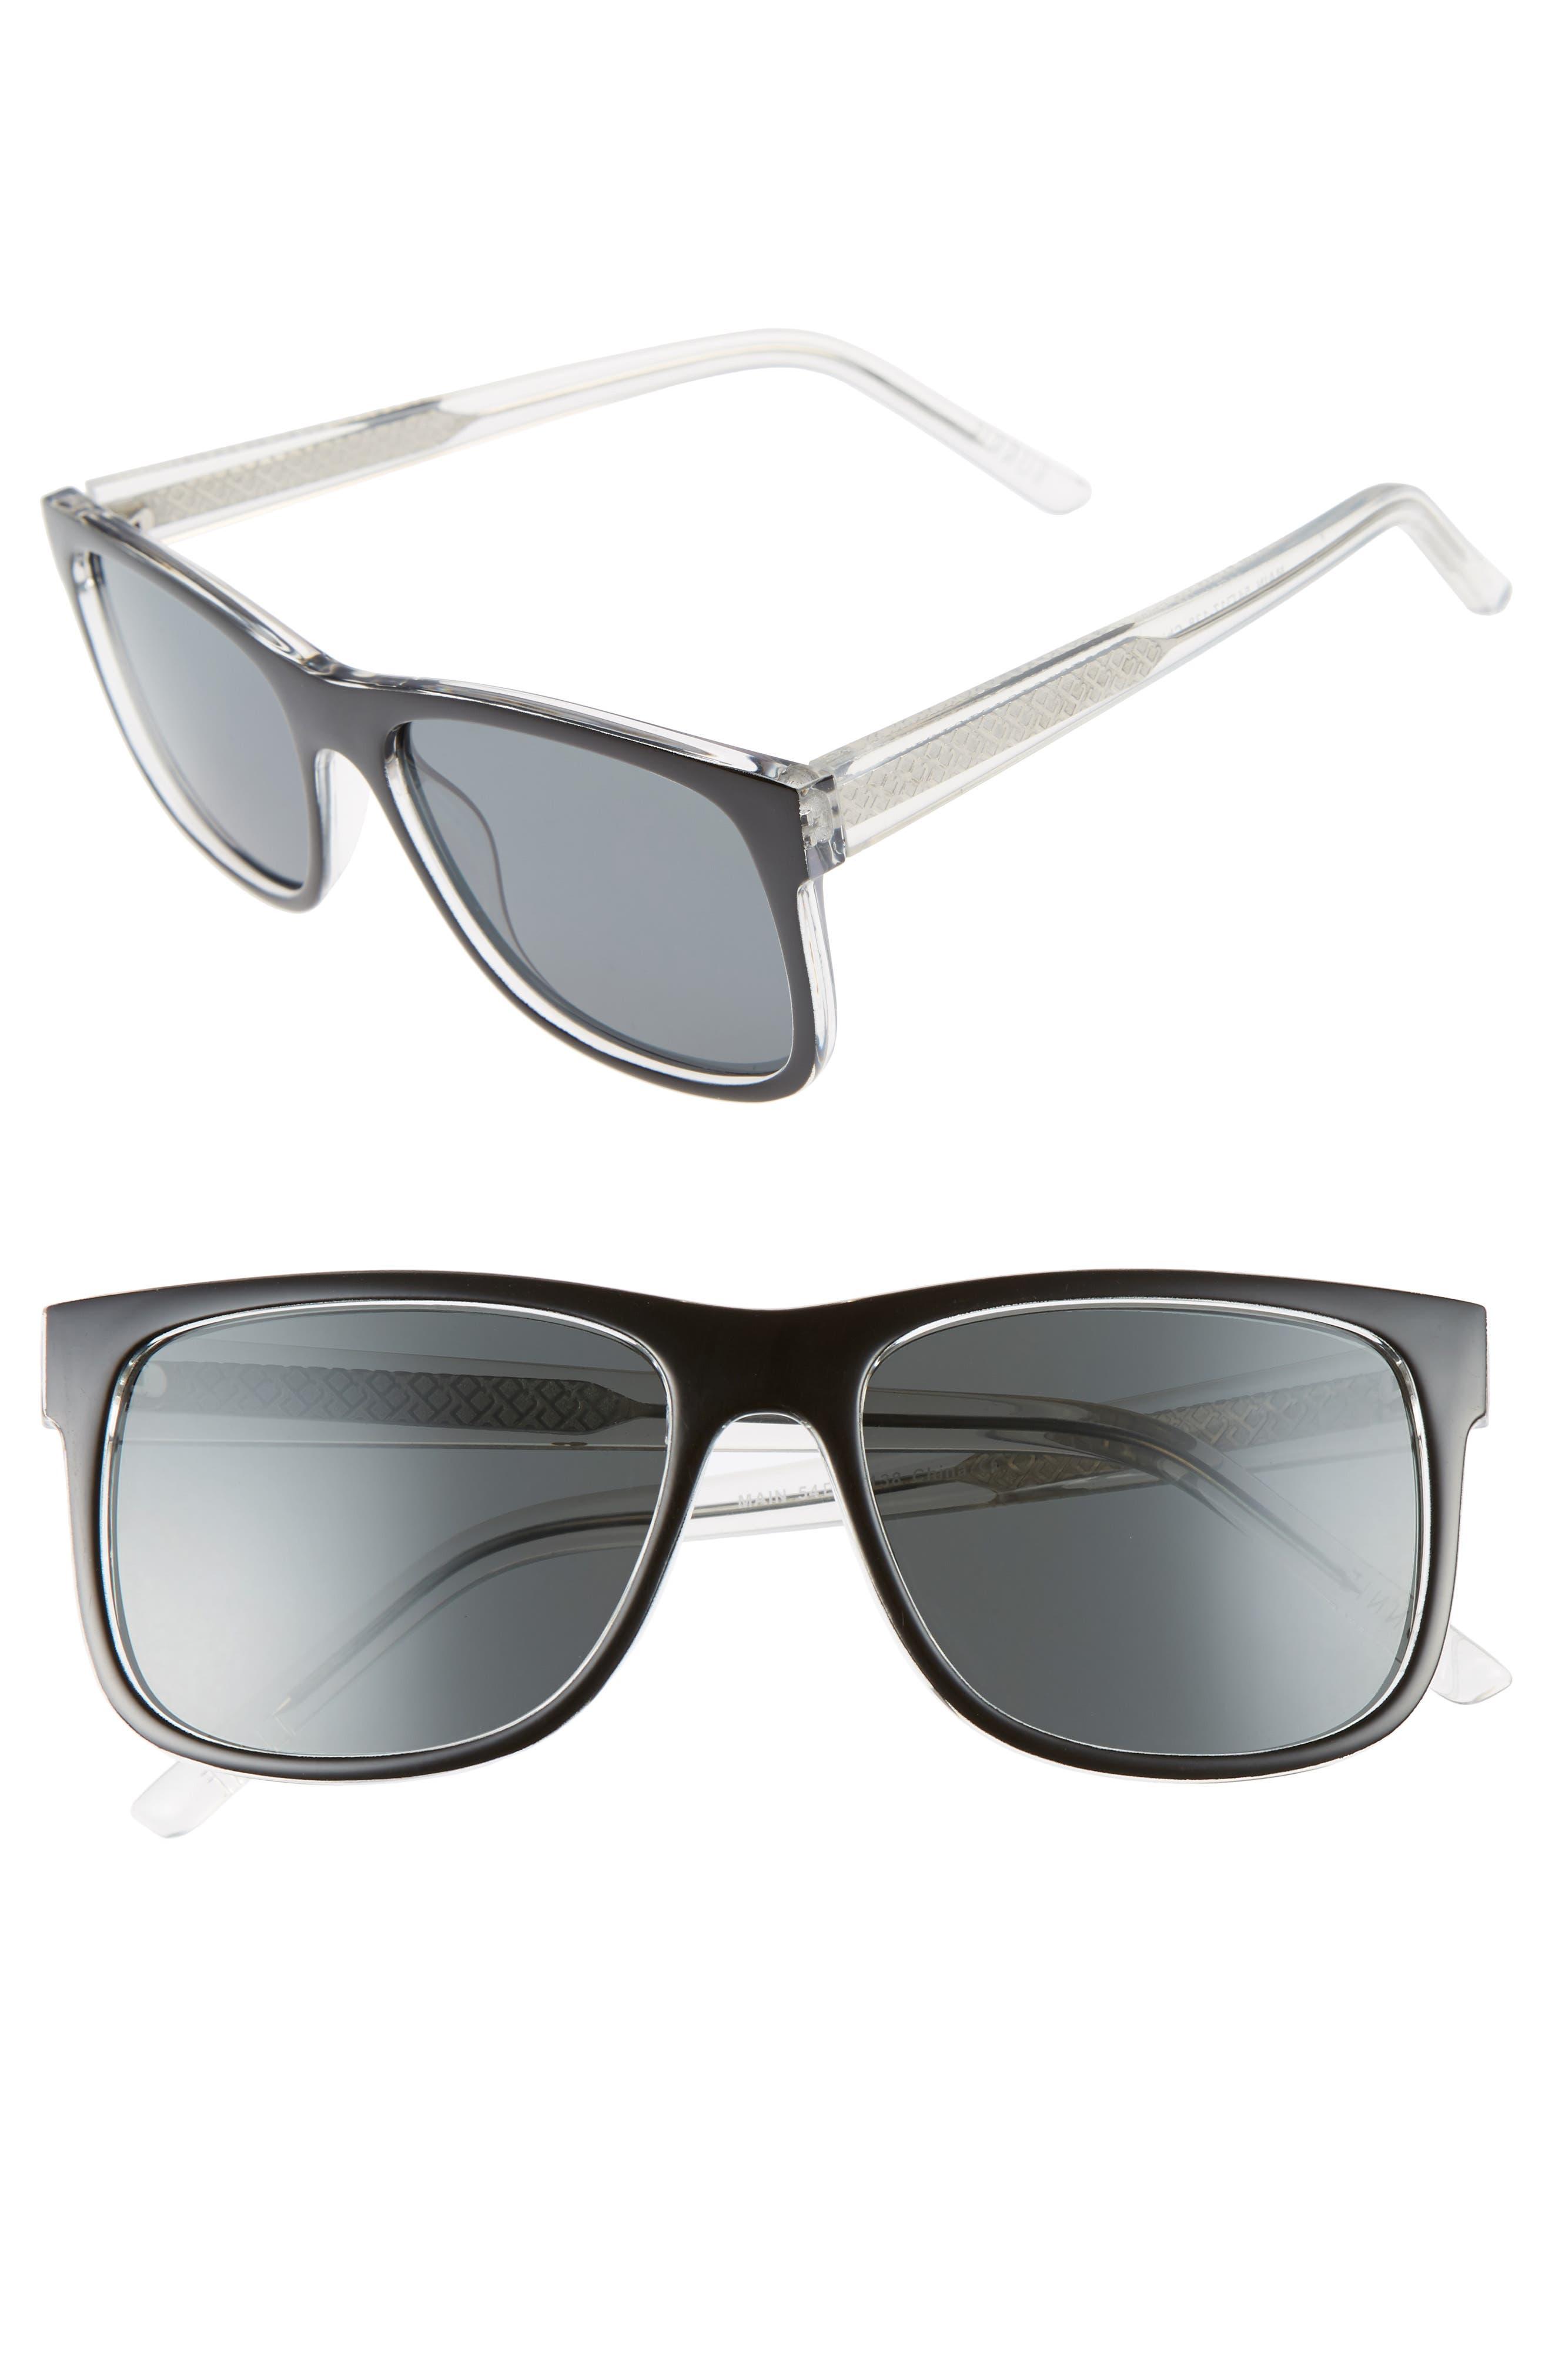 Main 54mm Polarized Sunglasses,                             Main thumbnail 2, color,